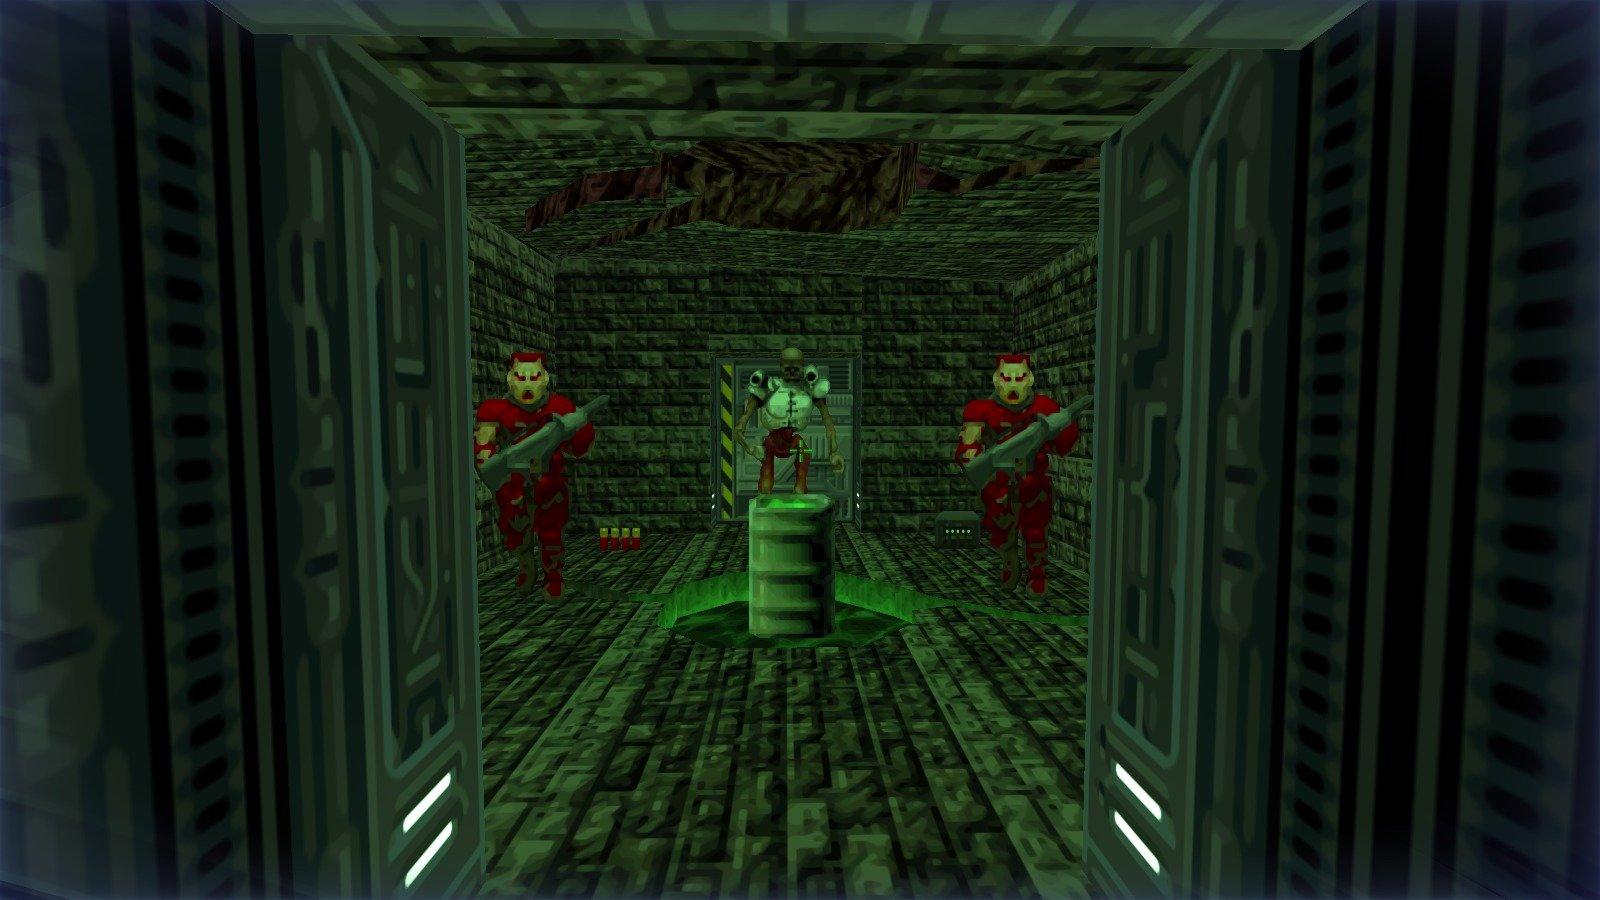 DRRP Doom RPG Remake Project Reactor